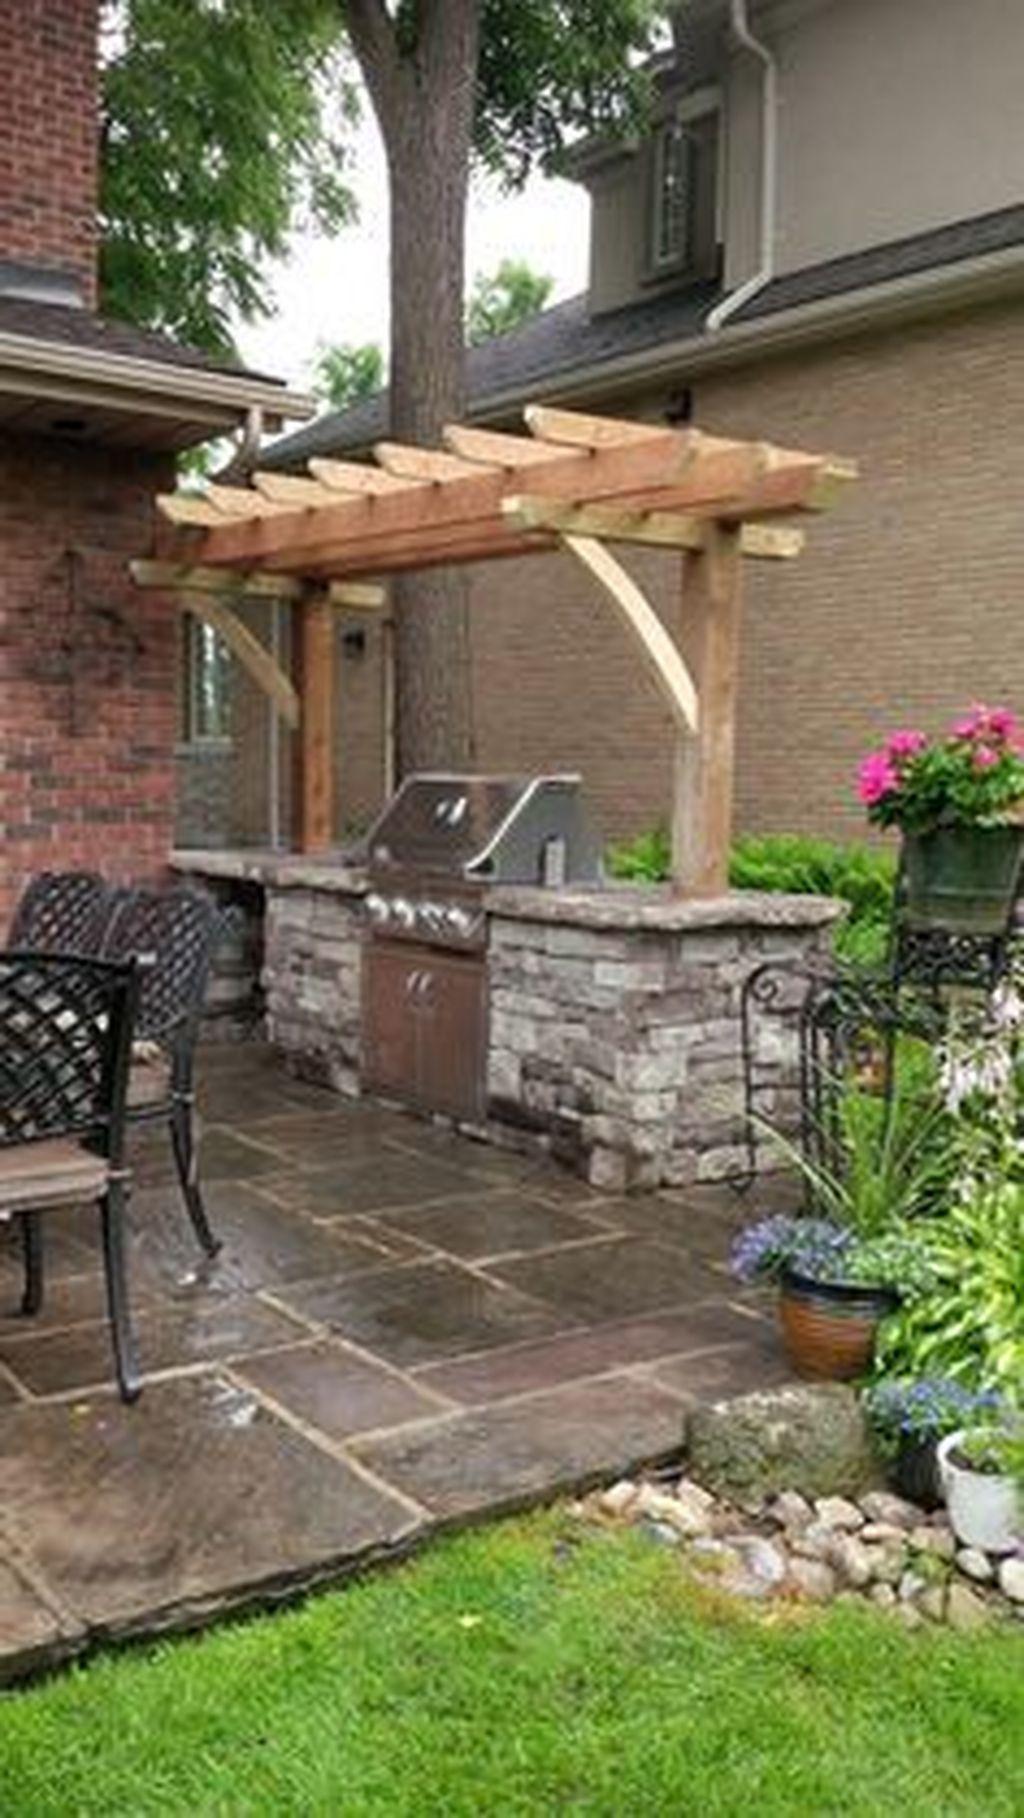 20 Marvelous Outdoor Kitchen Design Ideas In Backyard Trenduhome Backyard Patio Designs Backyard Diy Patio